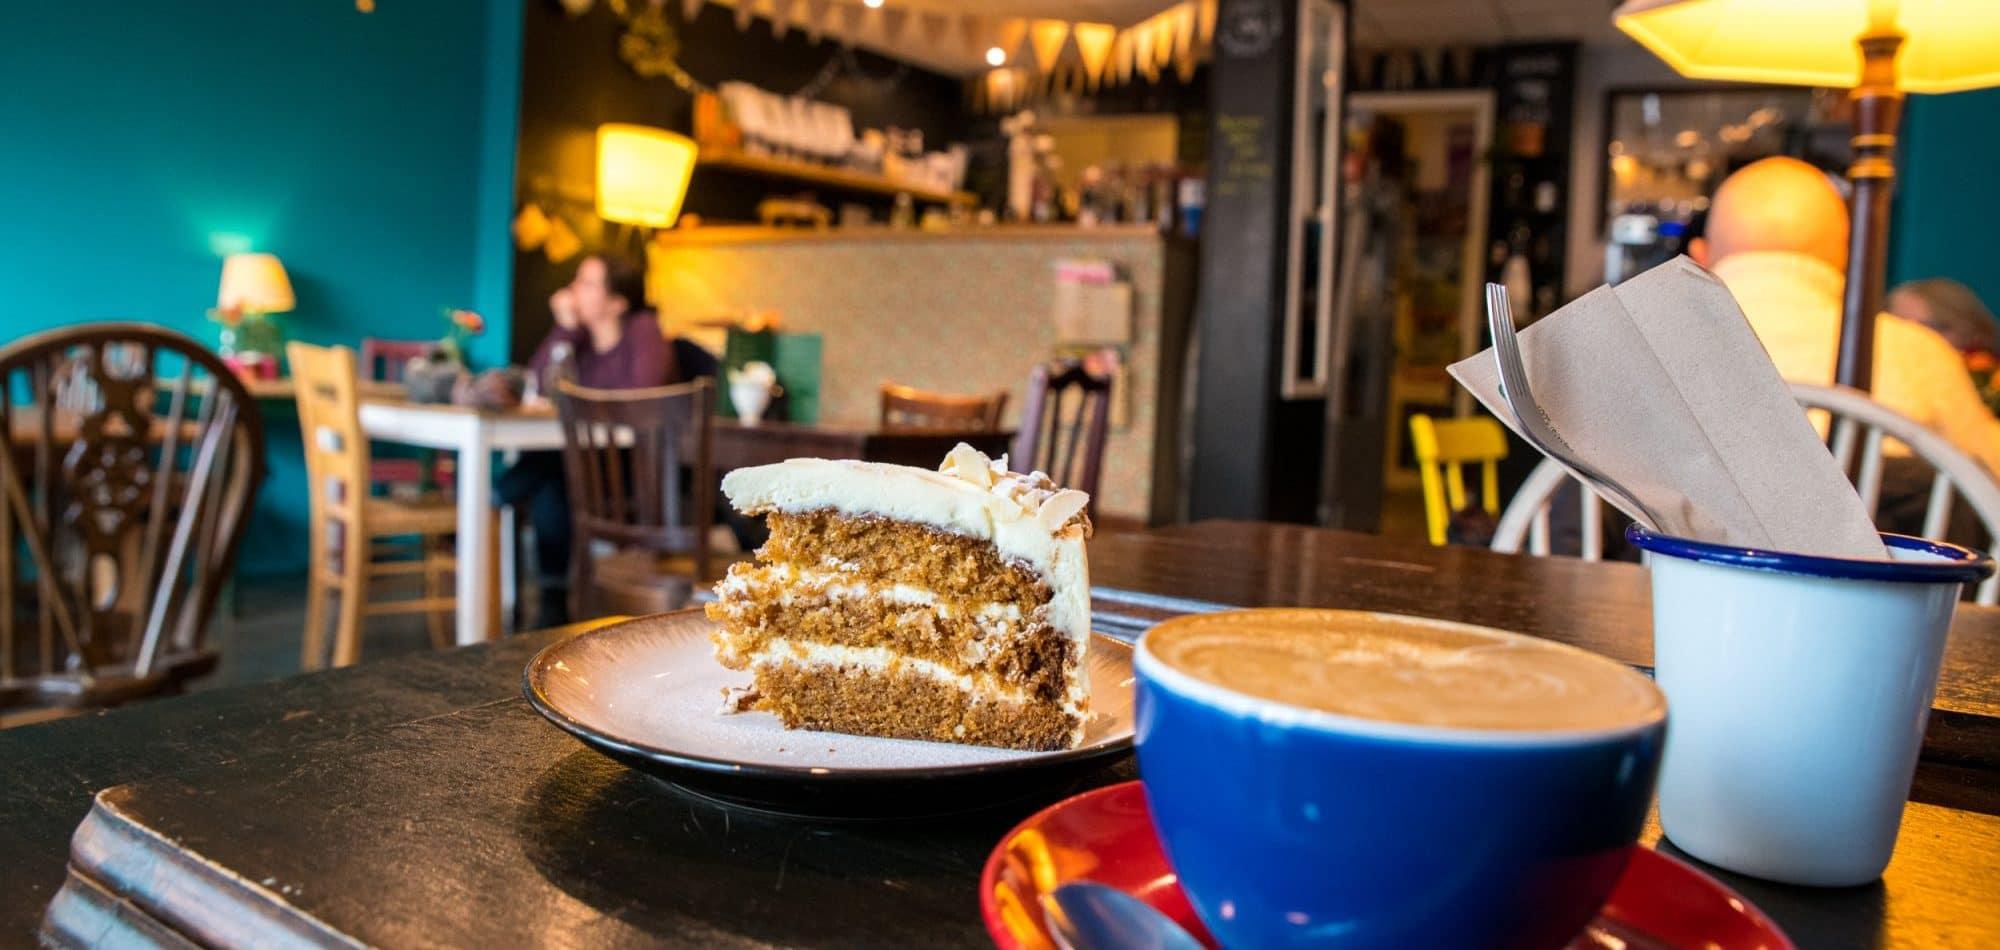 edinburgh-cafe-roadtrip-scotland-siredwards